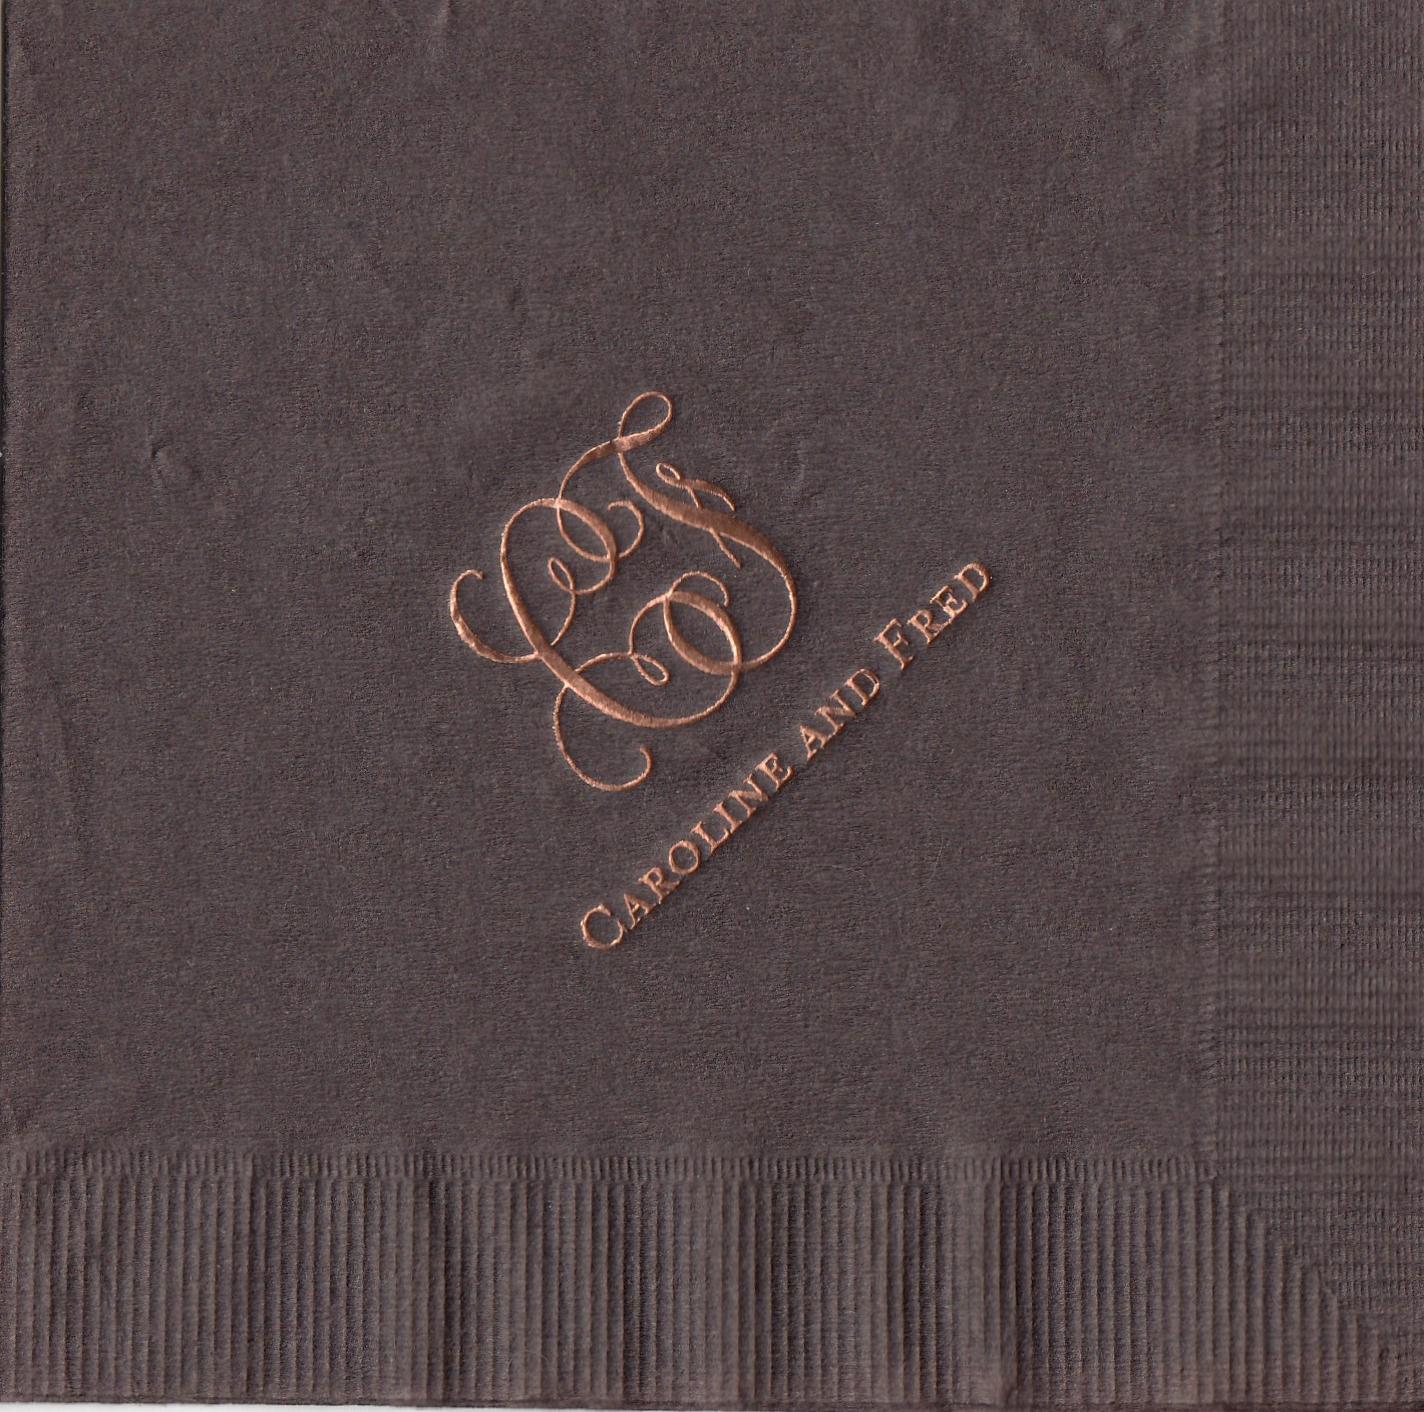 Napkin: Mocha  Imprint: Penny Foil  Beverage  Sample 4